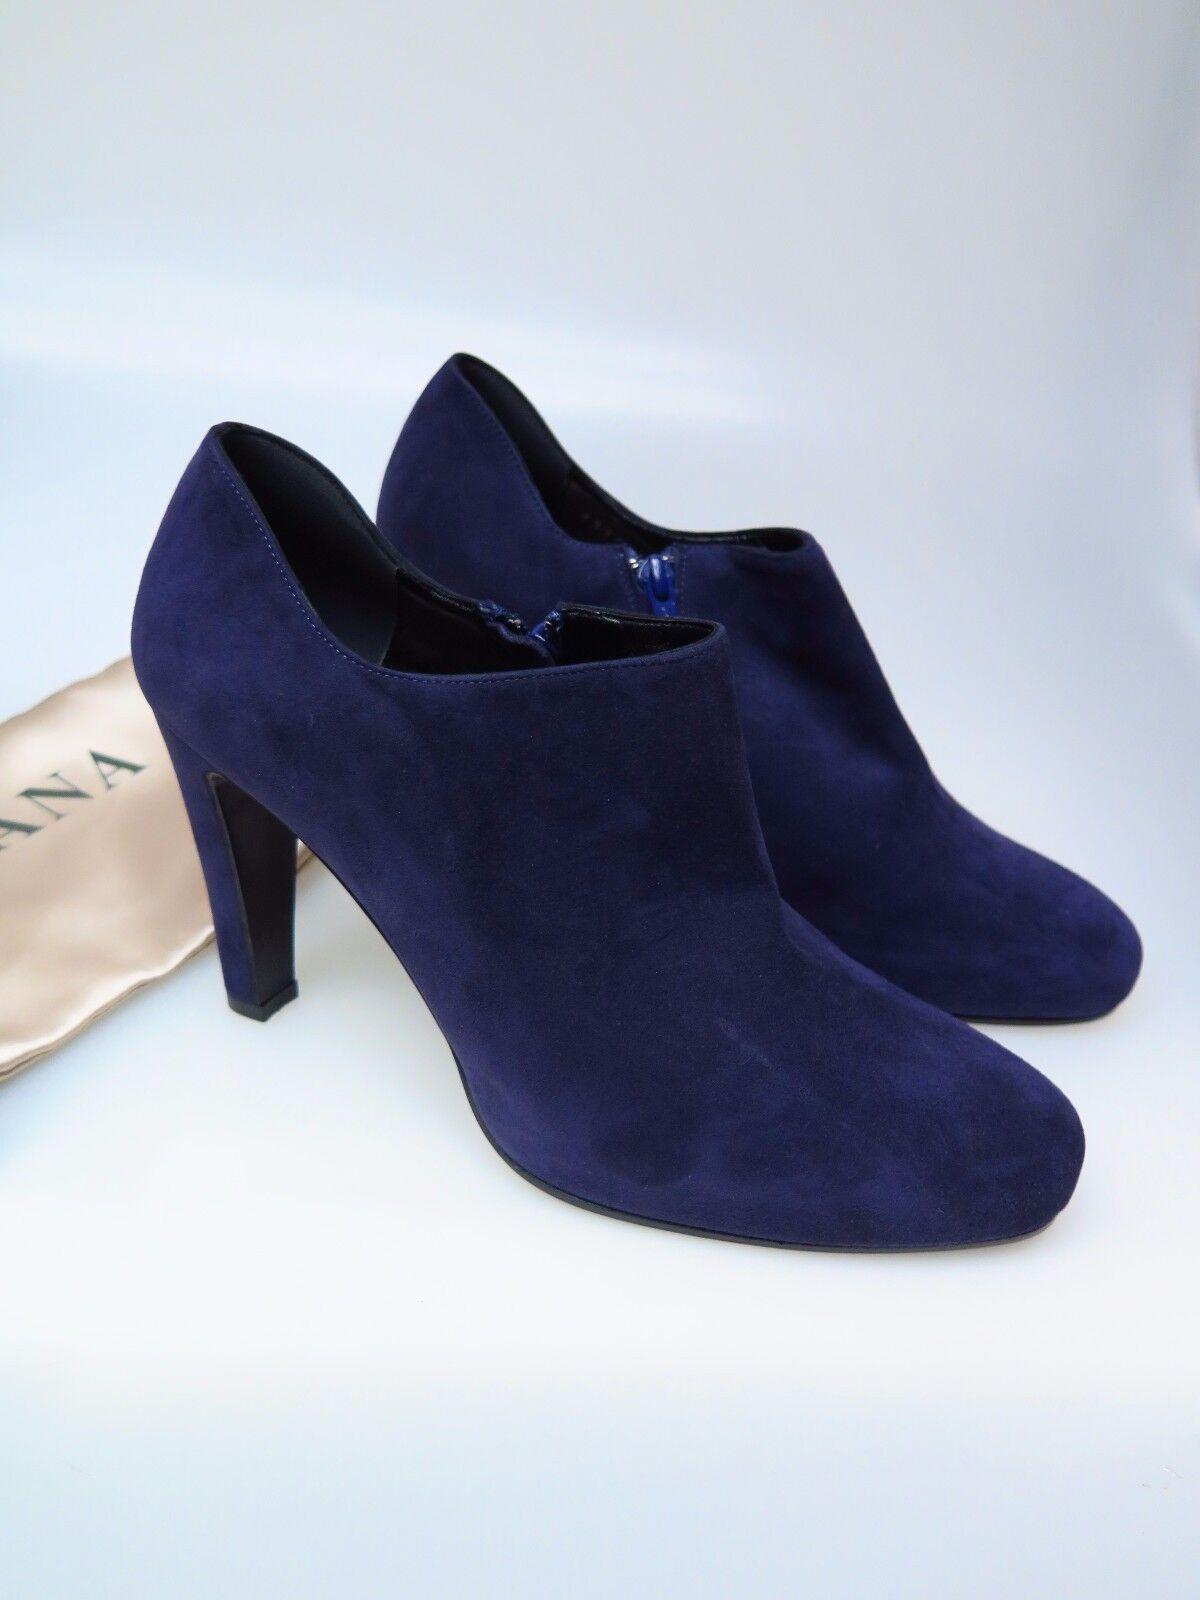 SULTANA  Damenschuhe Stiefeletten Stiefel Leder N4257 N4257 N4257 Amber Lila Gr 39,5 NEU   9d3ff4